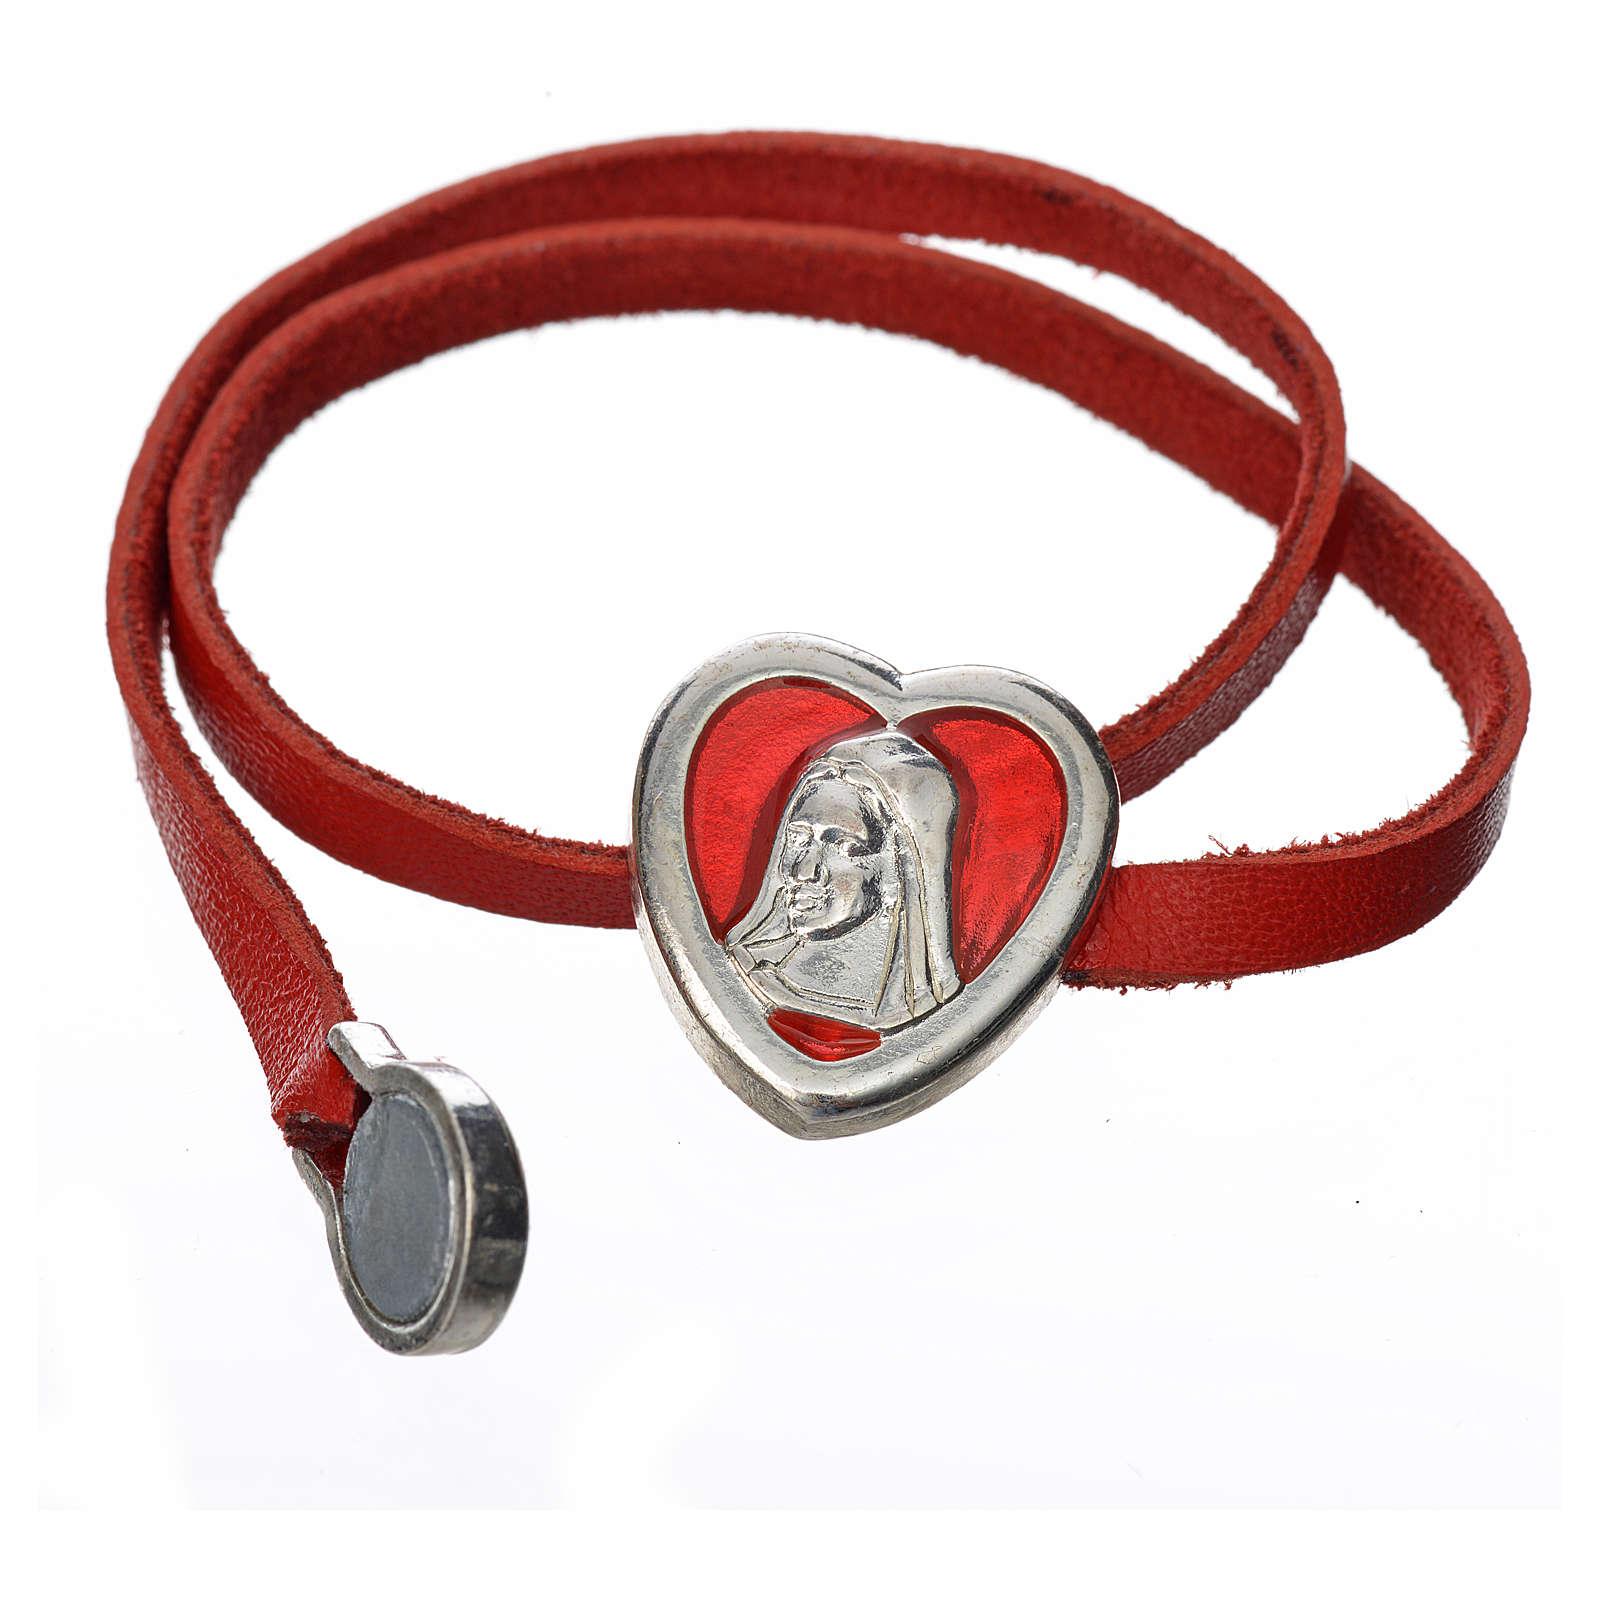 STOCK Bracciale pelle rossa placca Madonna 4